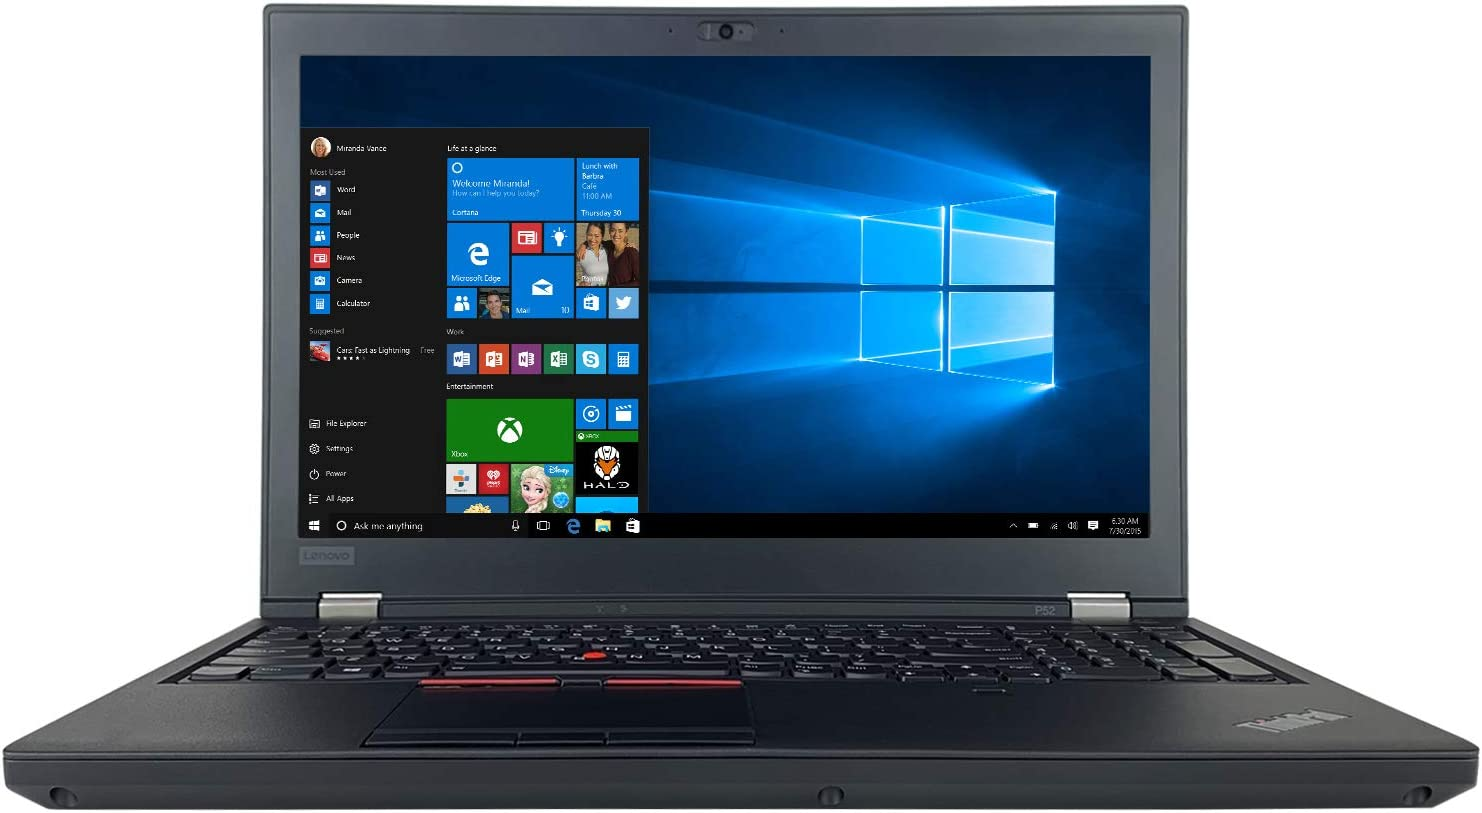 "Lenovo ThinkPad P52 15.6"" Full HD Laptop - 8th Gen Intel Core i7-8750H Processor up to 4.10 GHz, 128GB DDR4 RAM, 2TB (1TB x 2) M.2 Solid State Drive, NVIDIA Quadro P1000 4GB GDDR5, Windows 10 Pro"